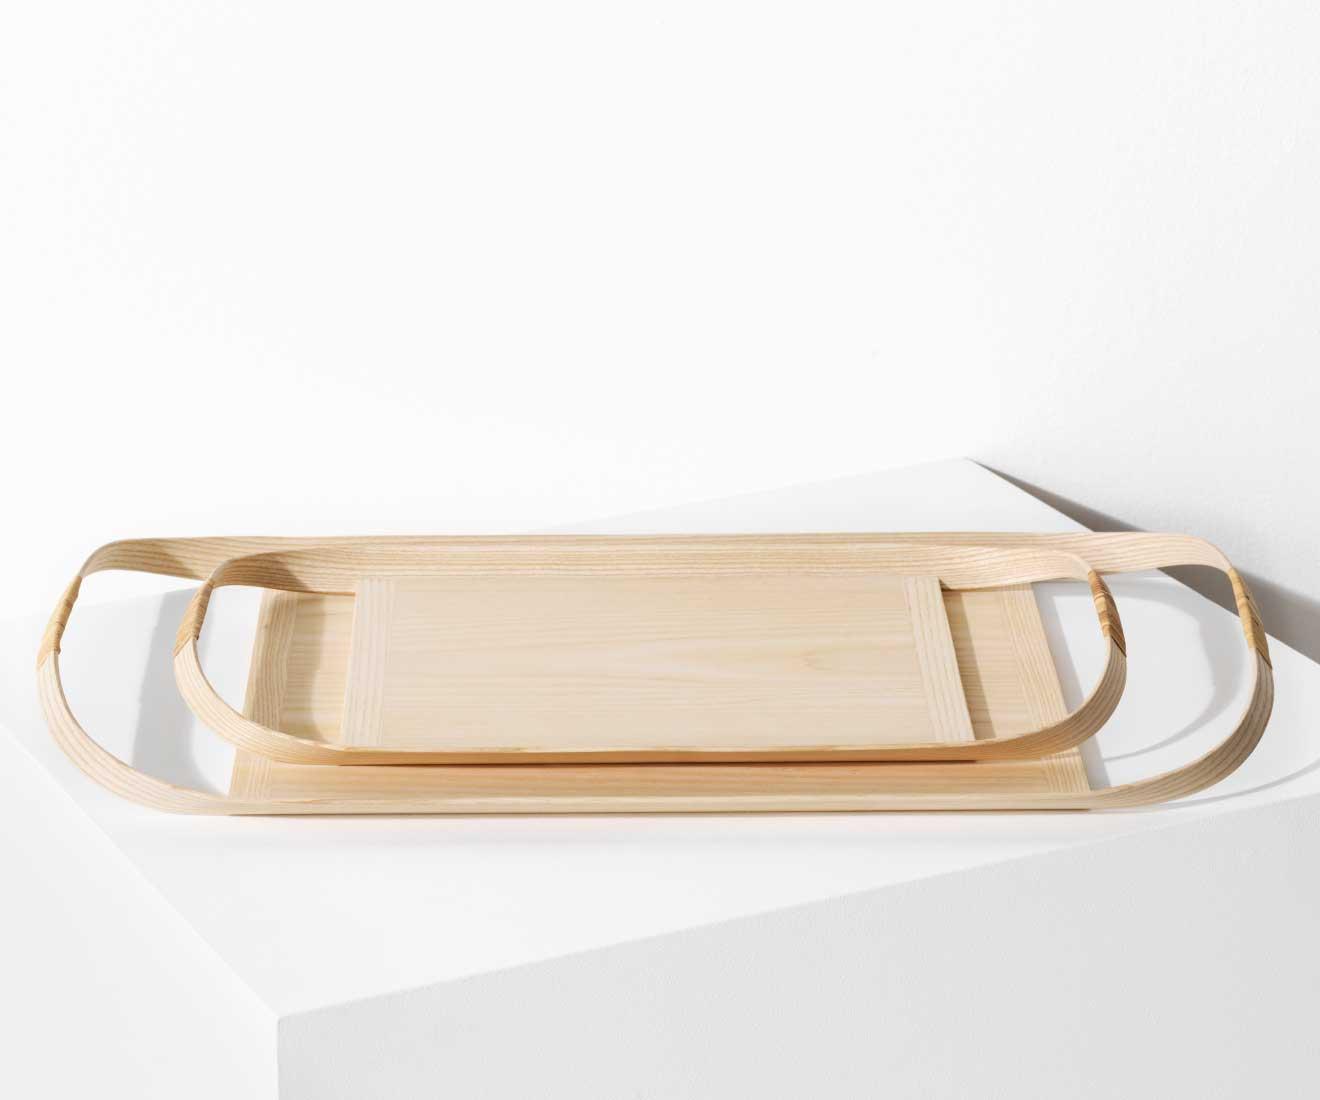 Motarasu Products - Union tray by Masuko Unayama in 2 sizes - small and large